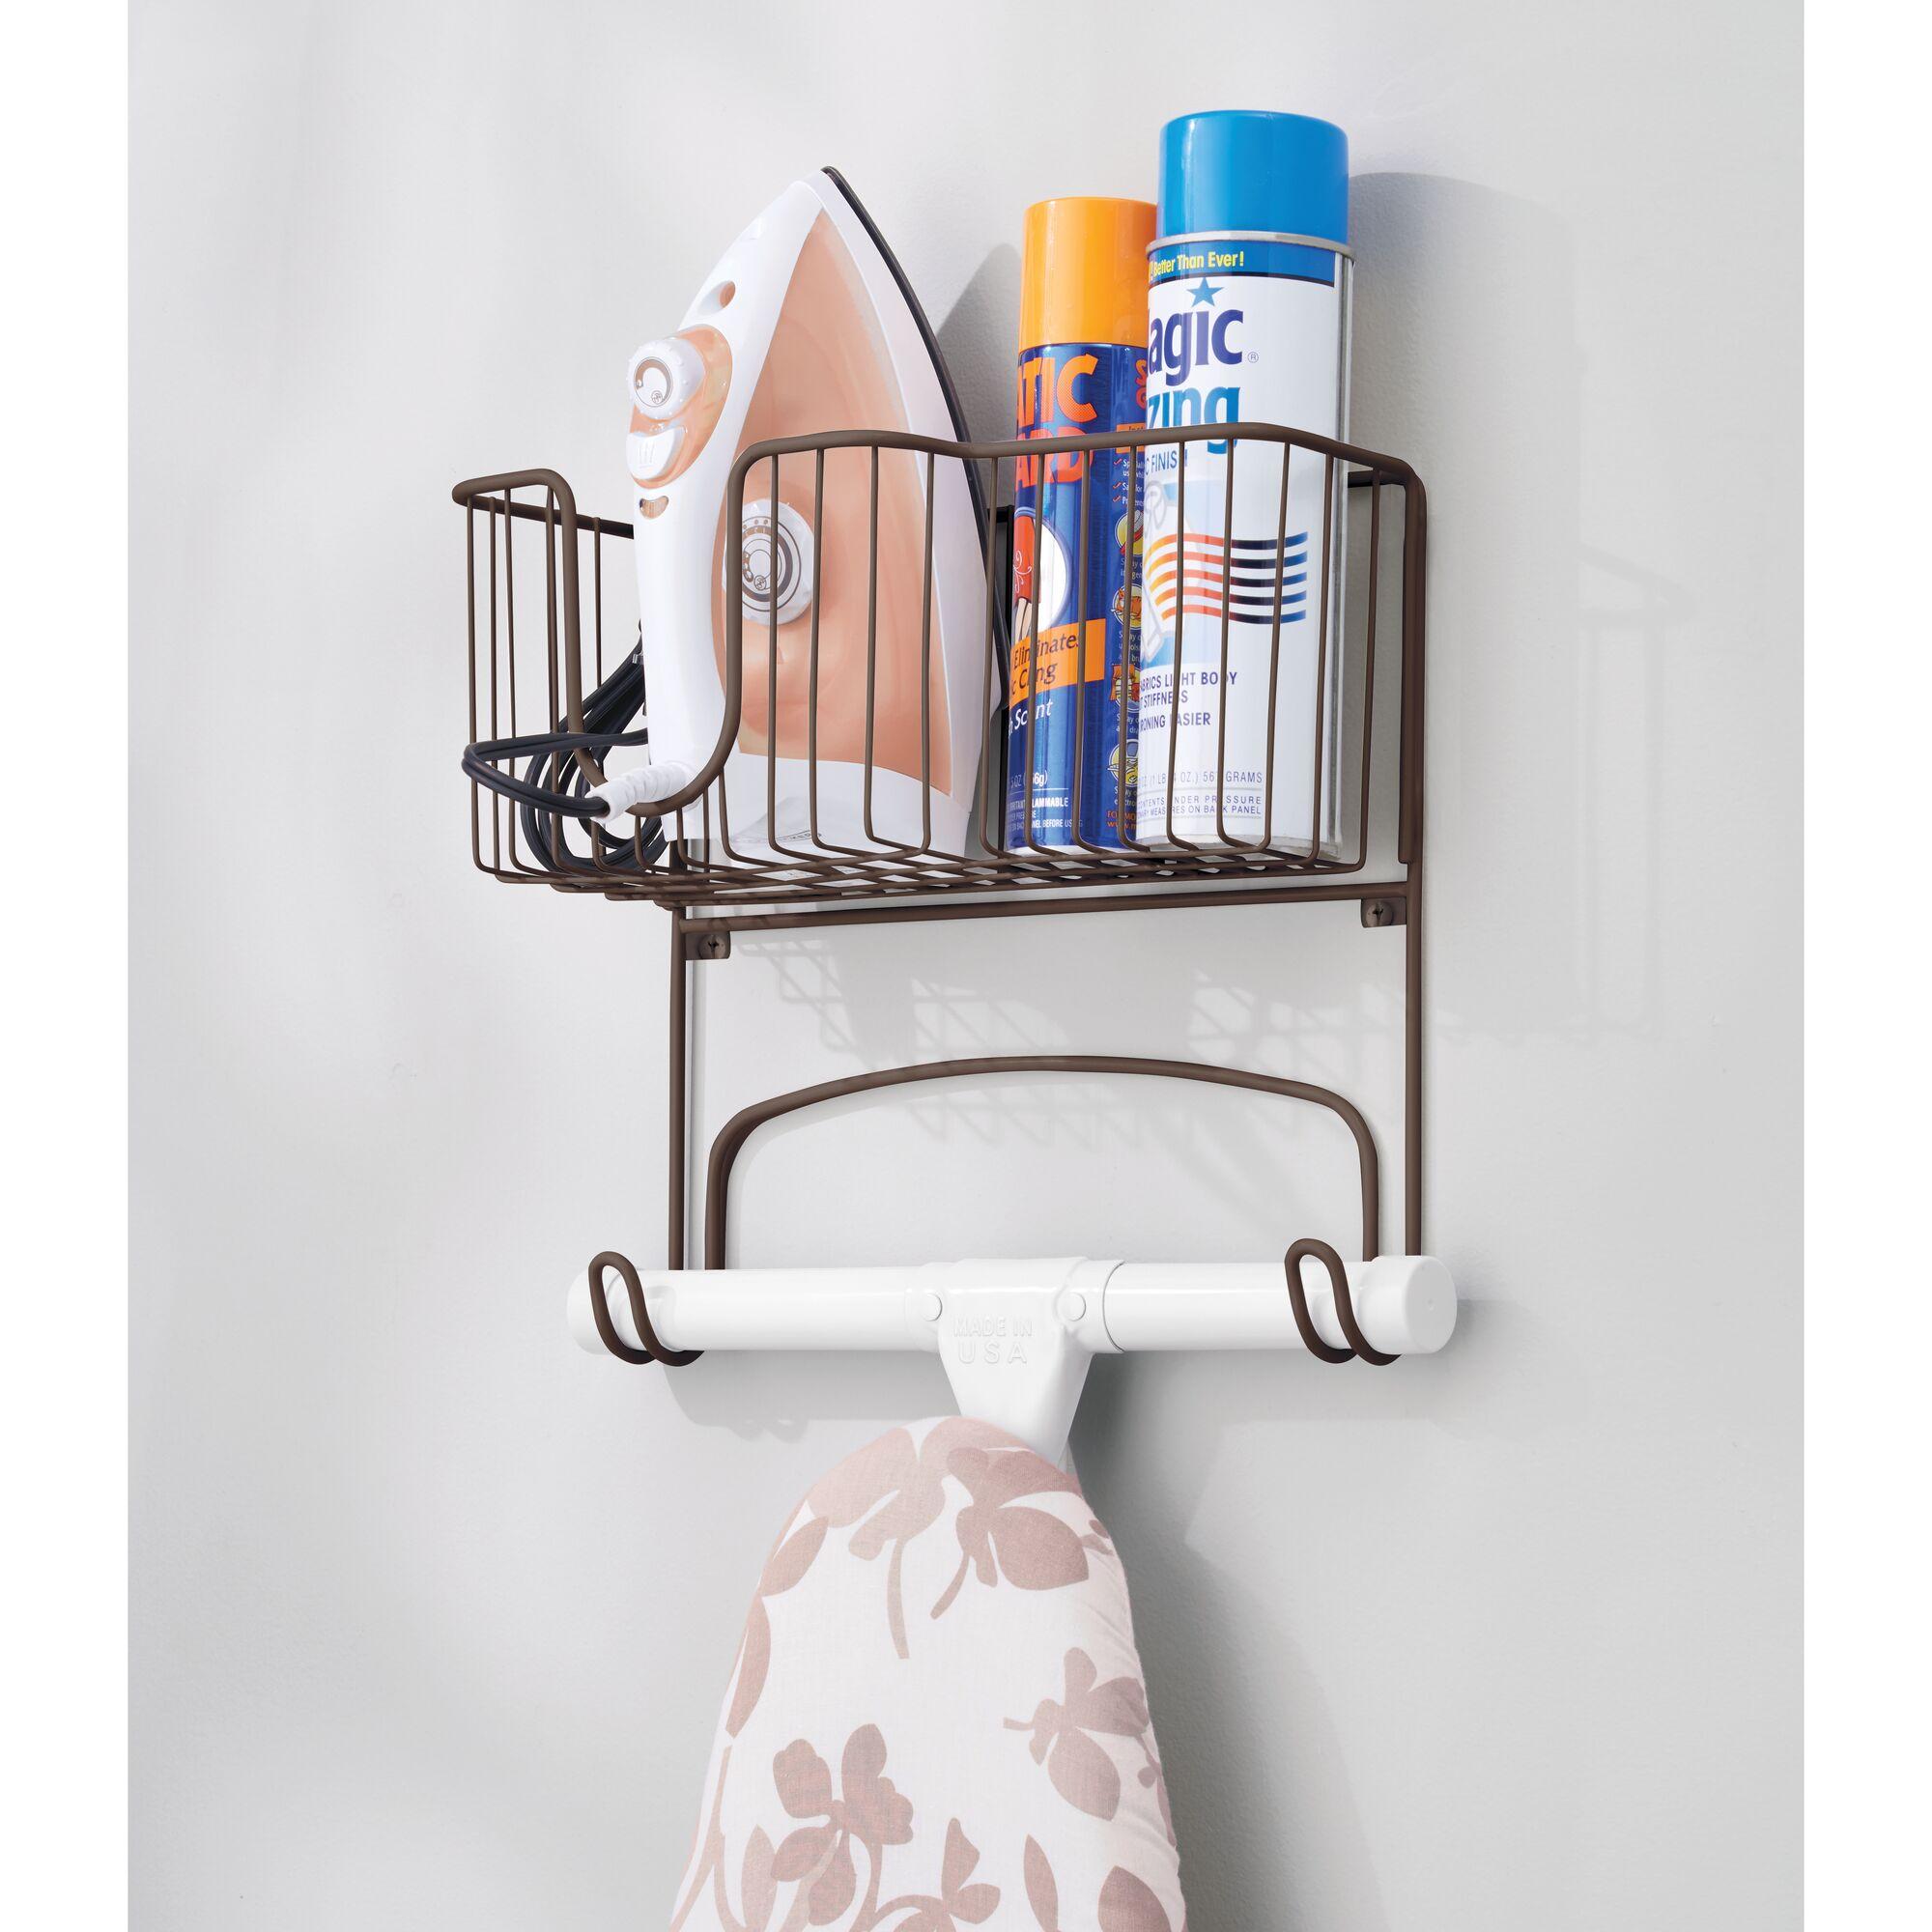 mDesign-Wall-Mount-Ironing-Board-Holder-Large-Storage-Basket thumbnail 15